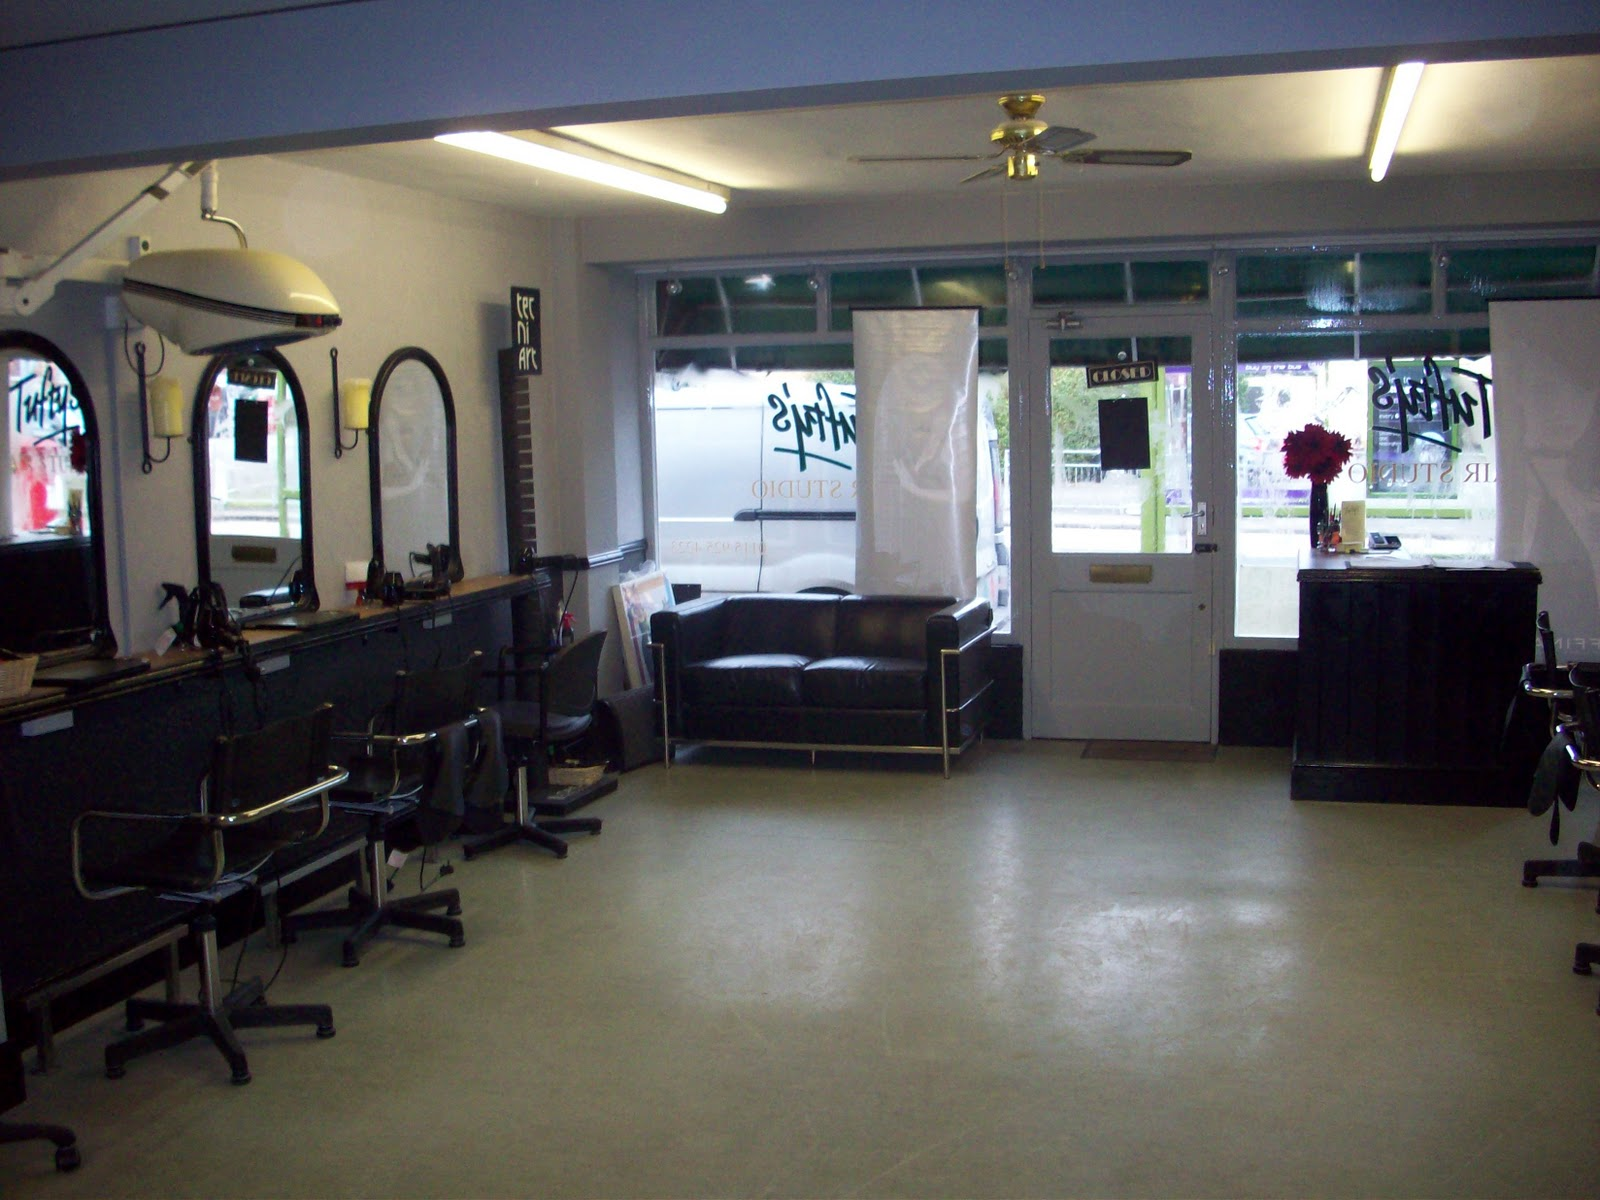 Hair Salon Wallpaper Tuftys hair salon in chilwell 1600x1200